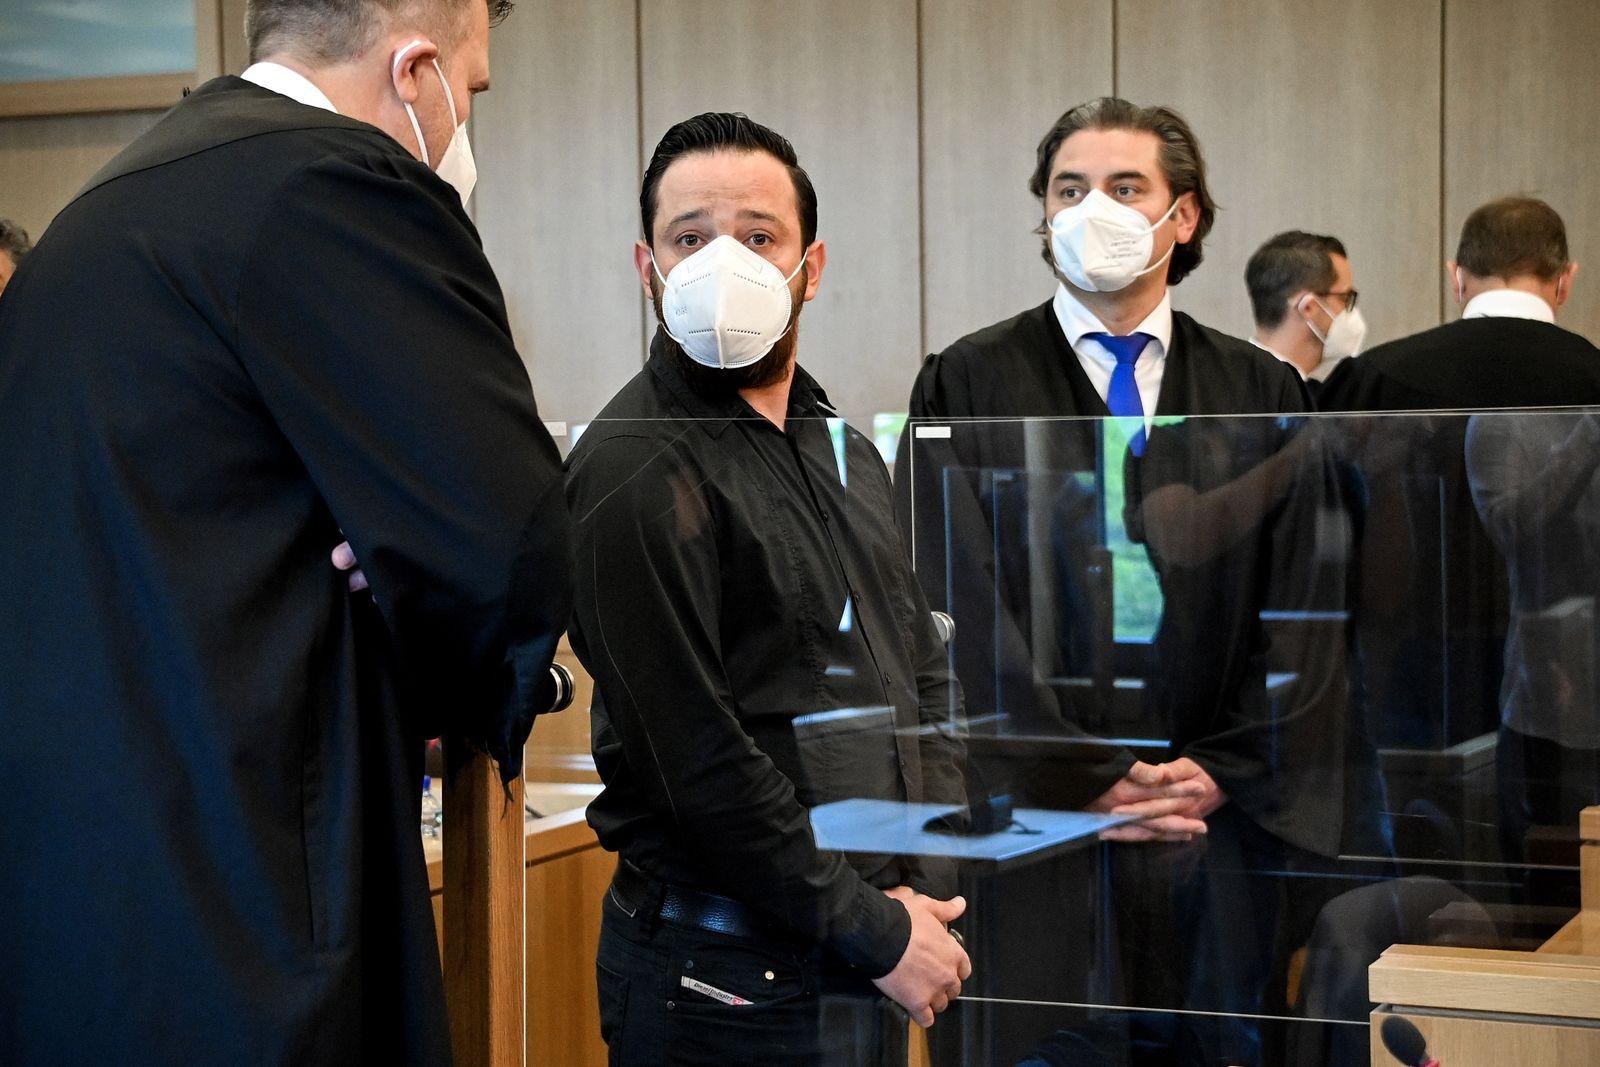 Trial against former Bundesliga soccer player Deniz Naki